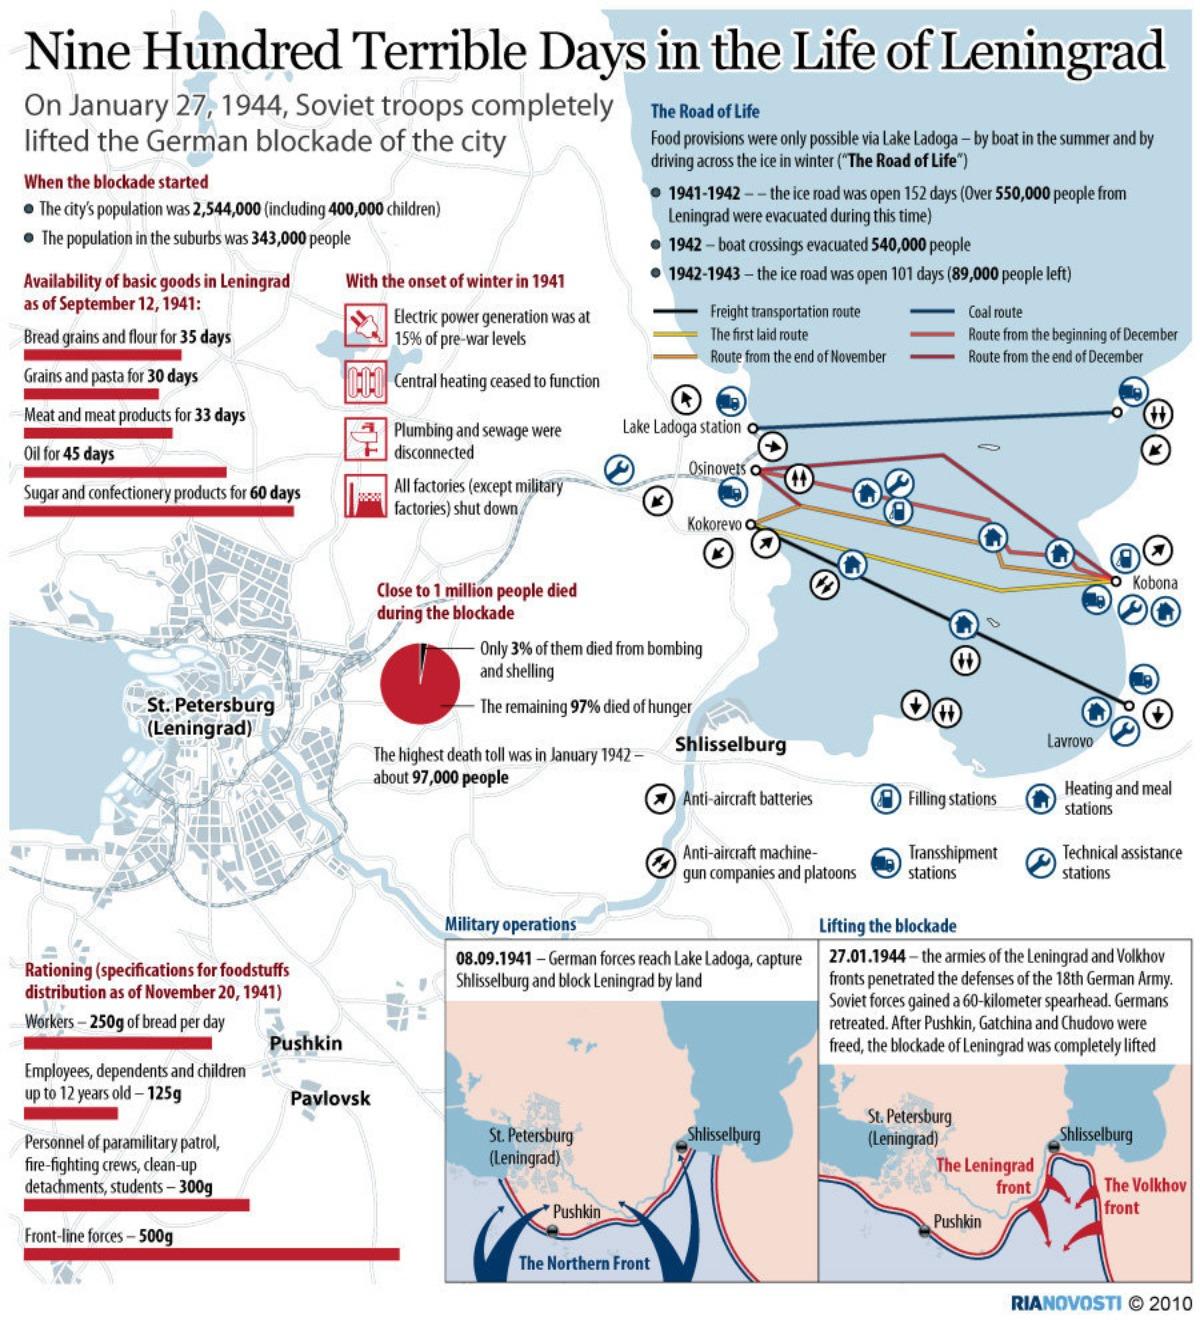 25 November Ria Novosti Infographics 900 Terrible